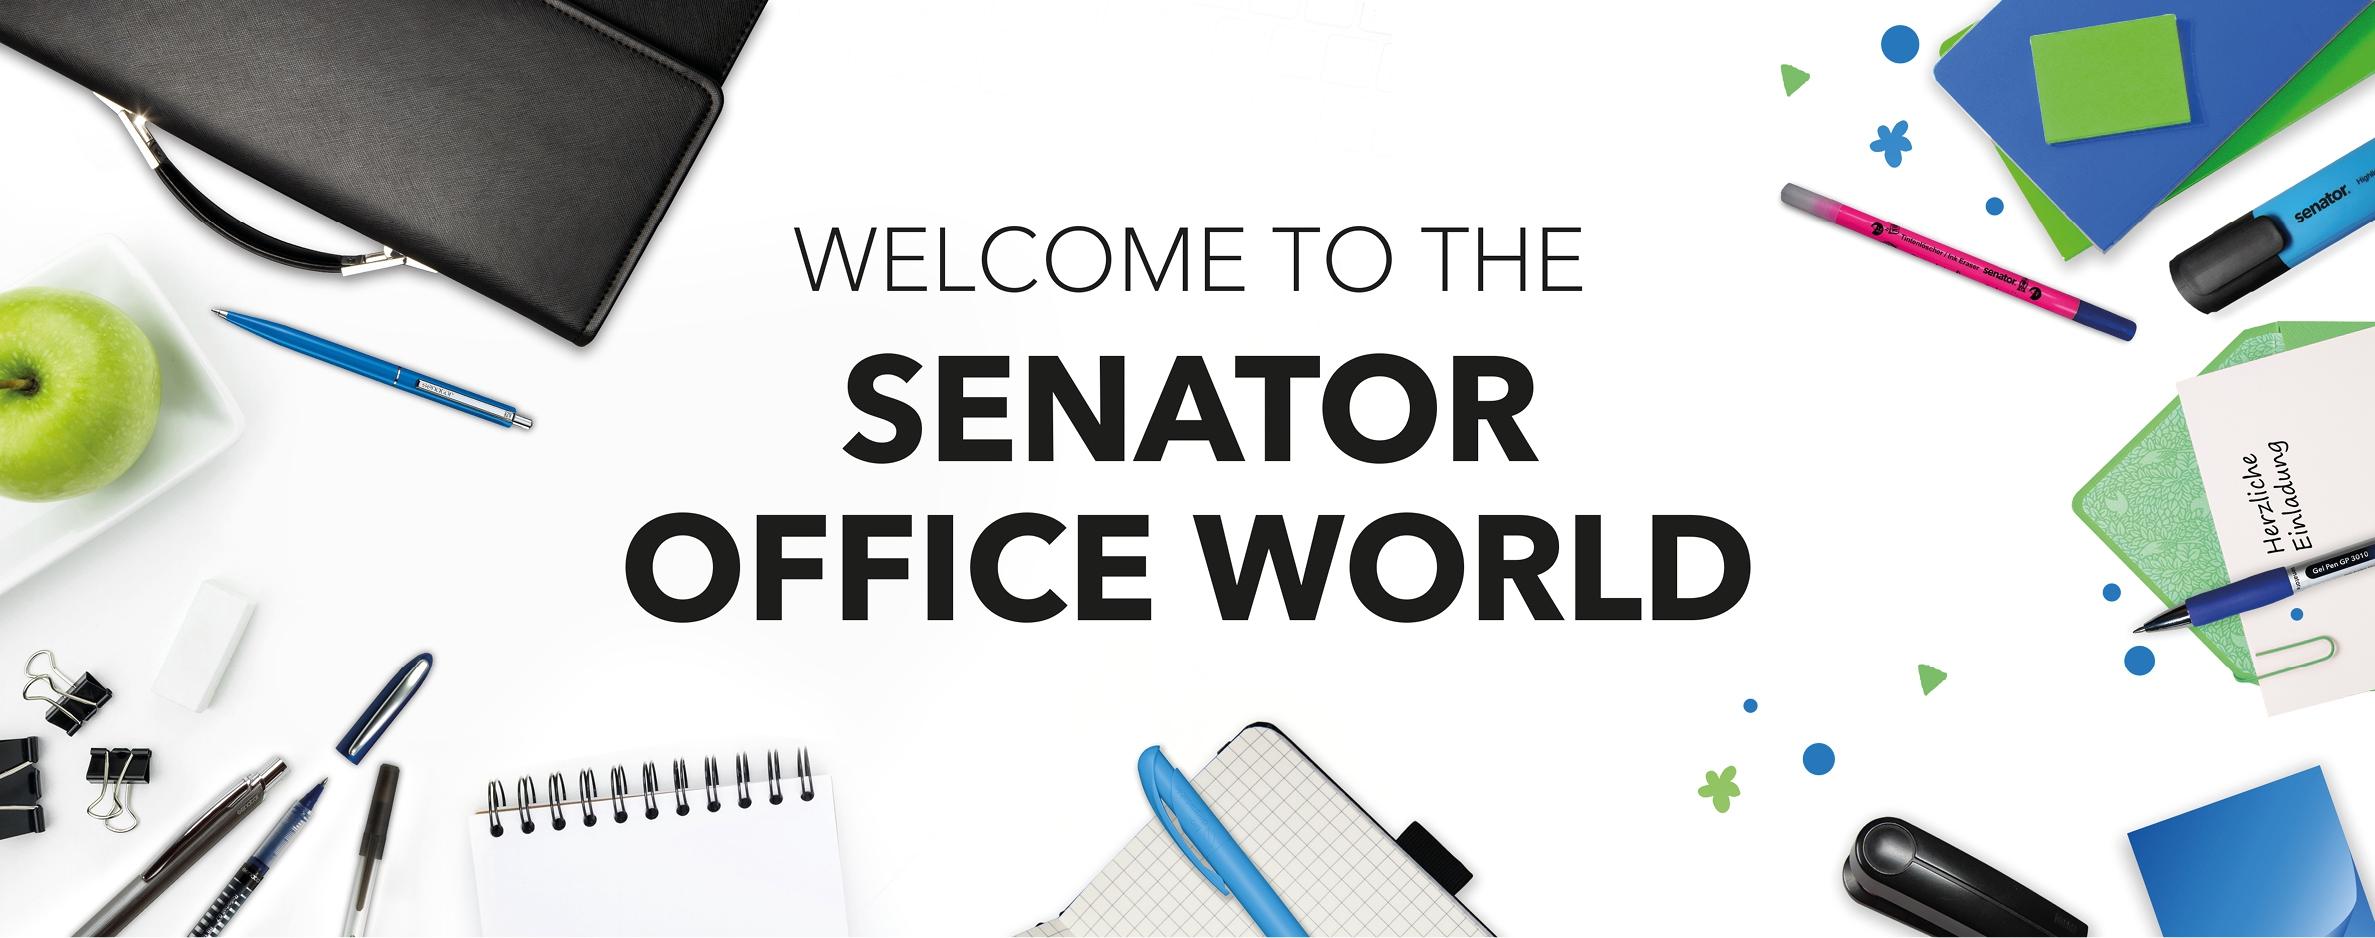 Senator Office World